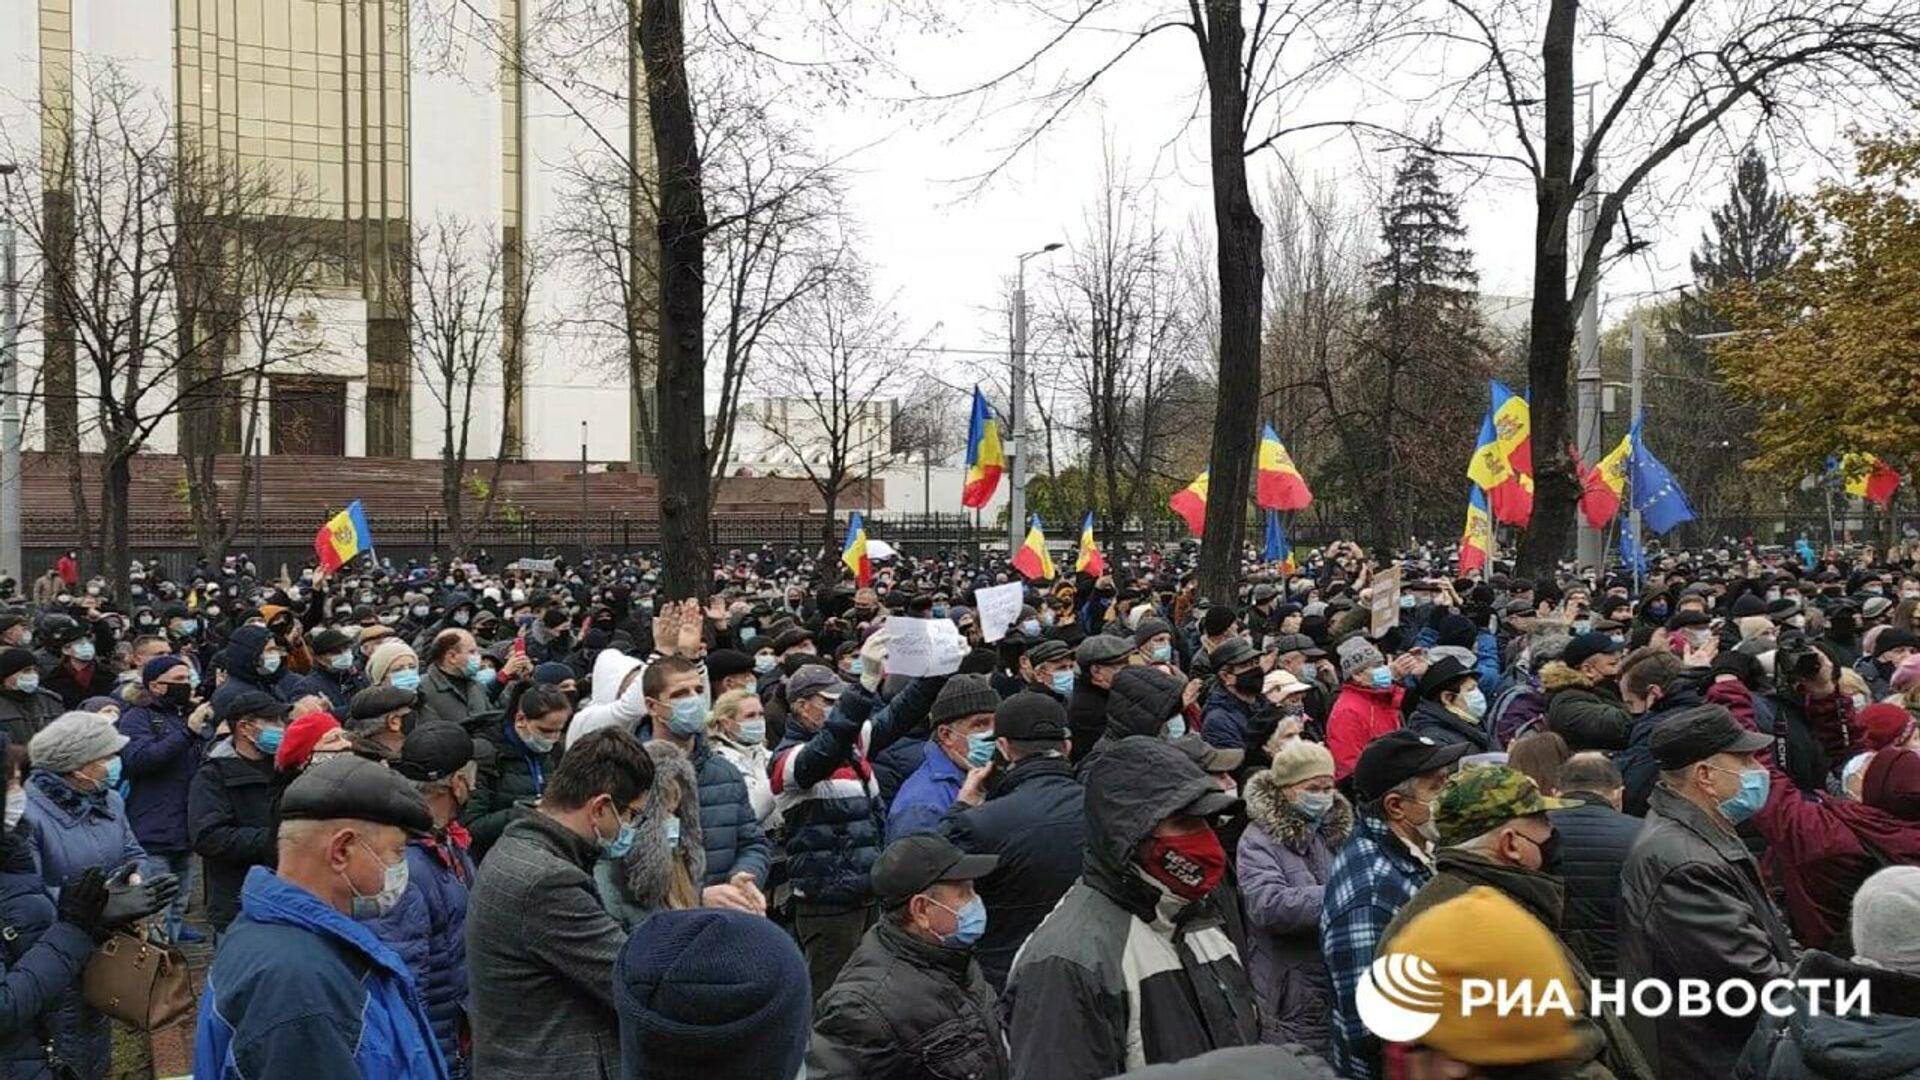 Сторонники Майи Санду собрались во время акции протеста перед зданием парламента в центре Кишинева - РИА Новости, 1920, 03.12.2020